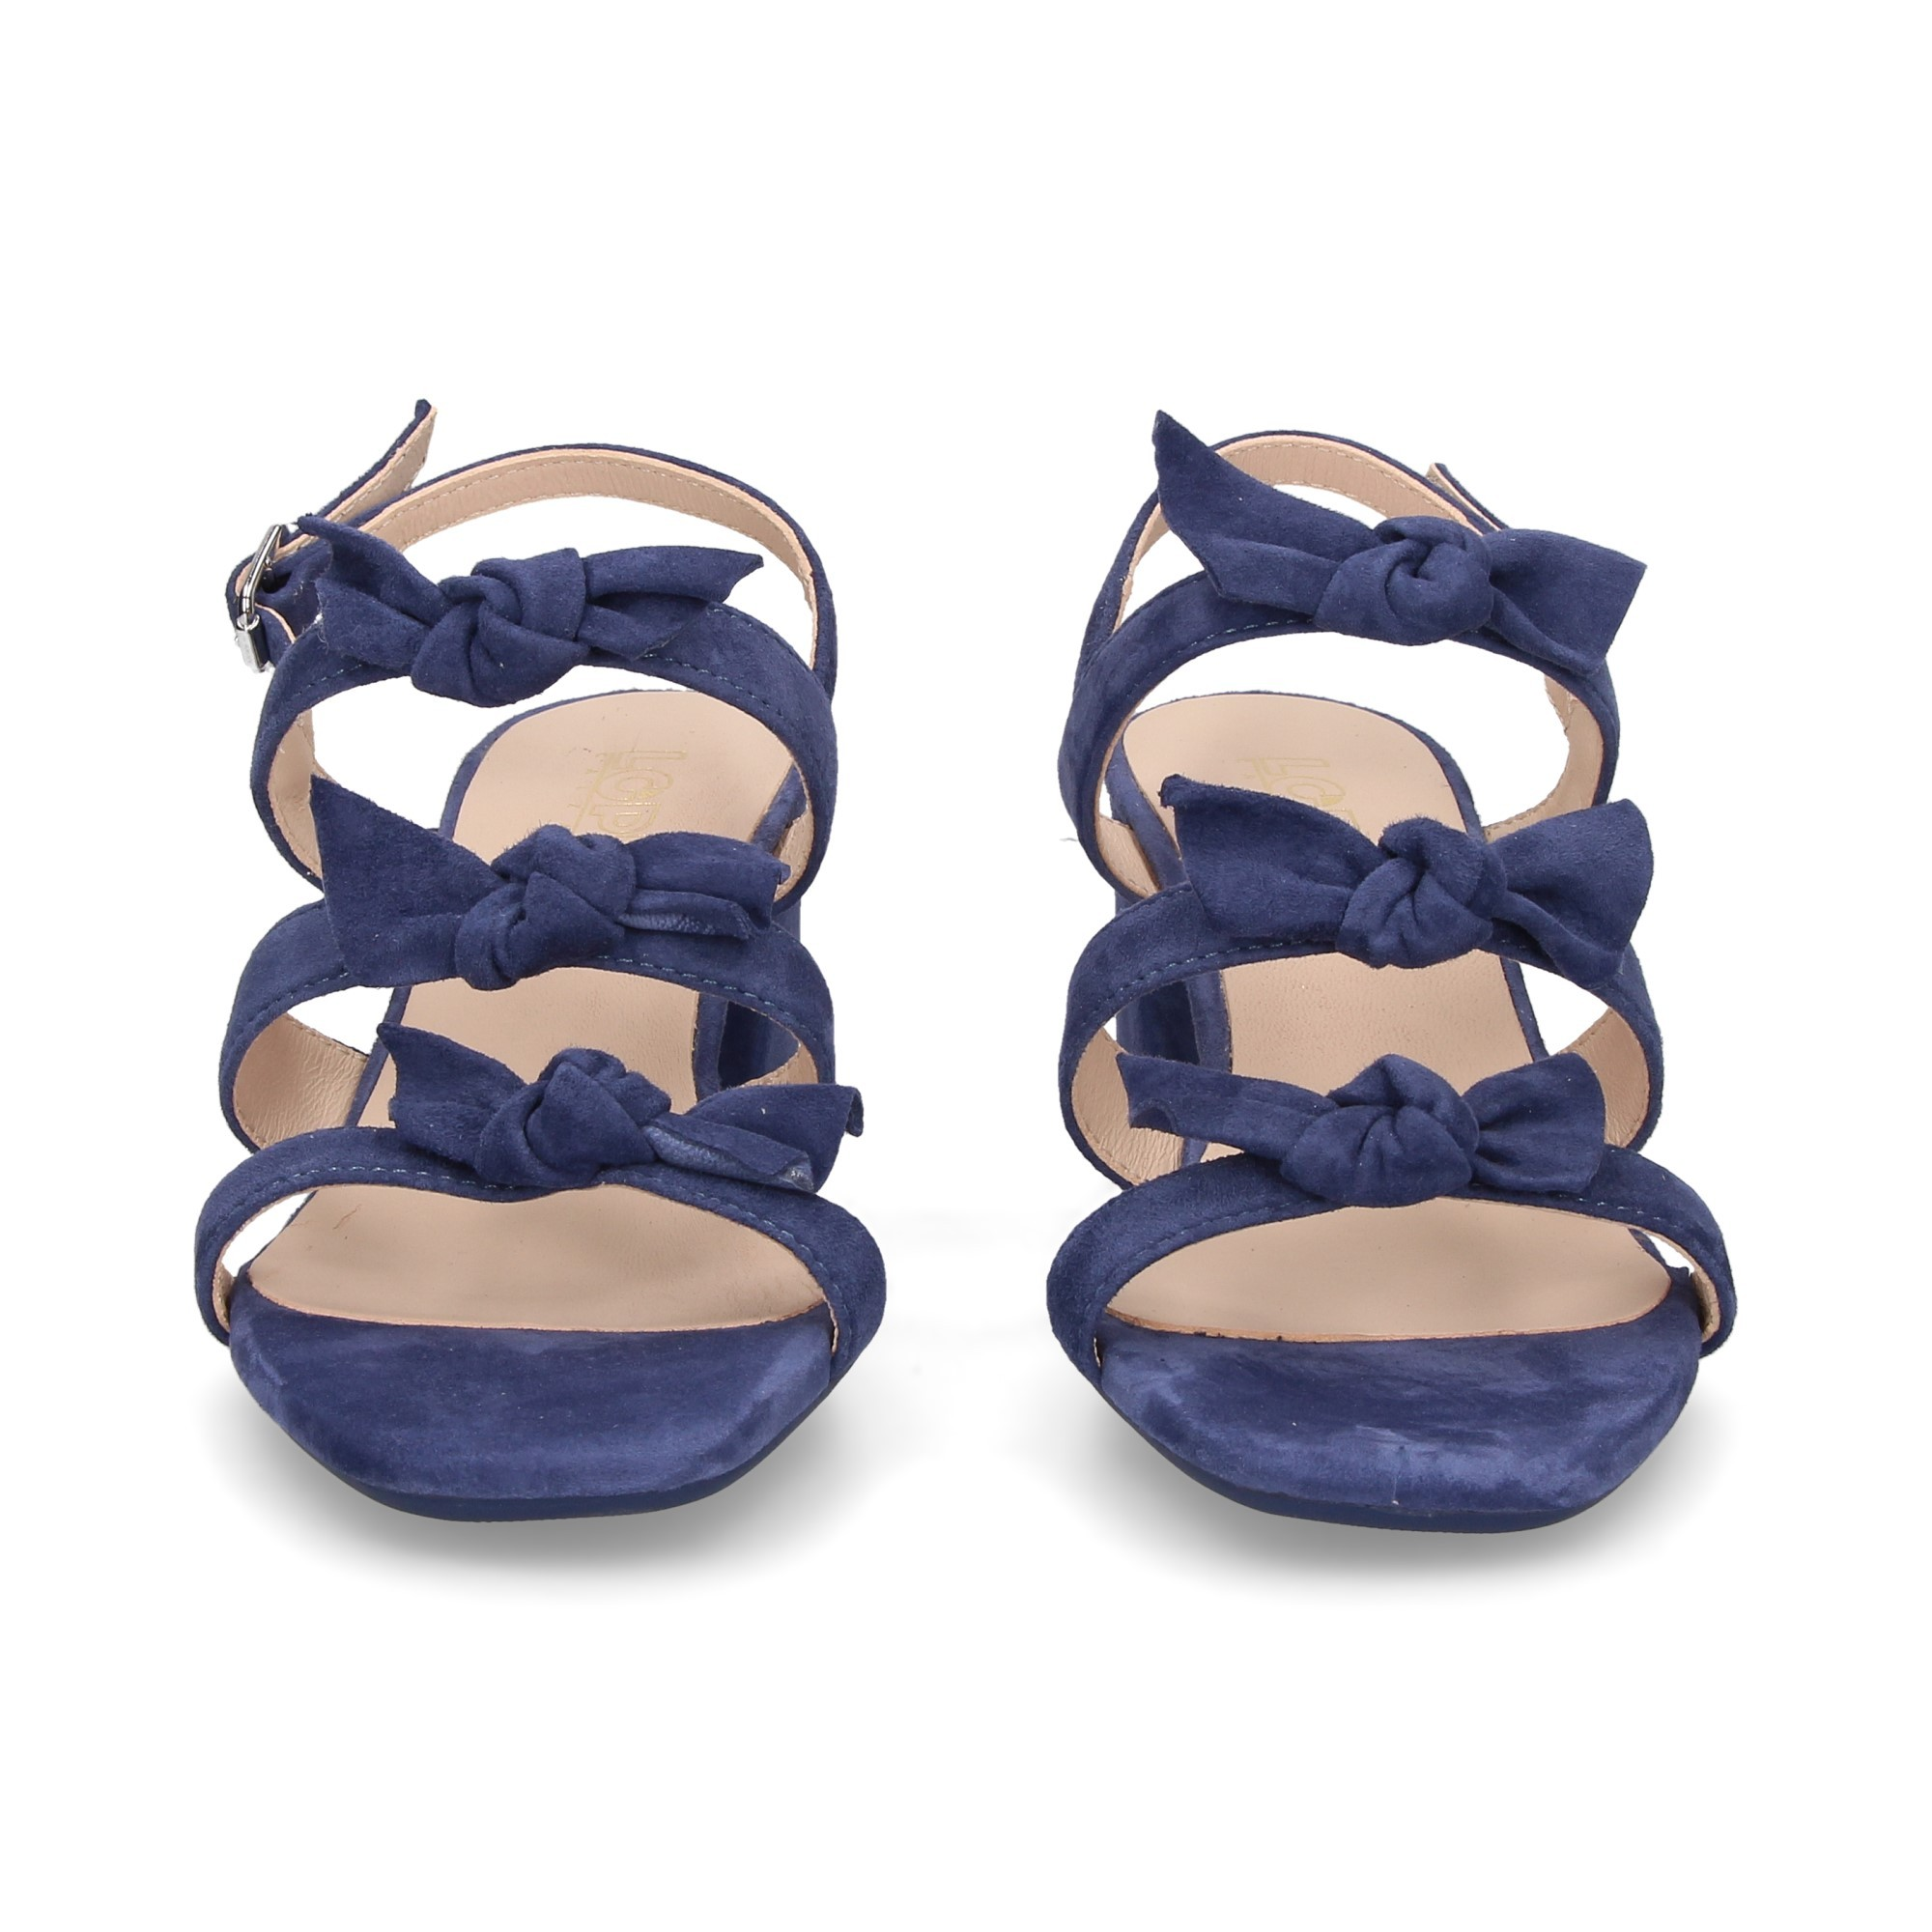 sandalia-3-tiras-lazo-ante-azul